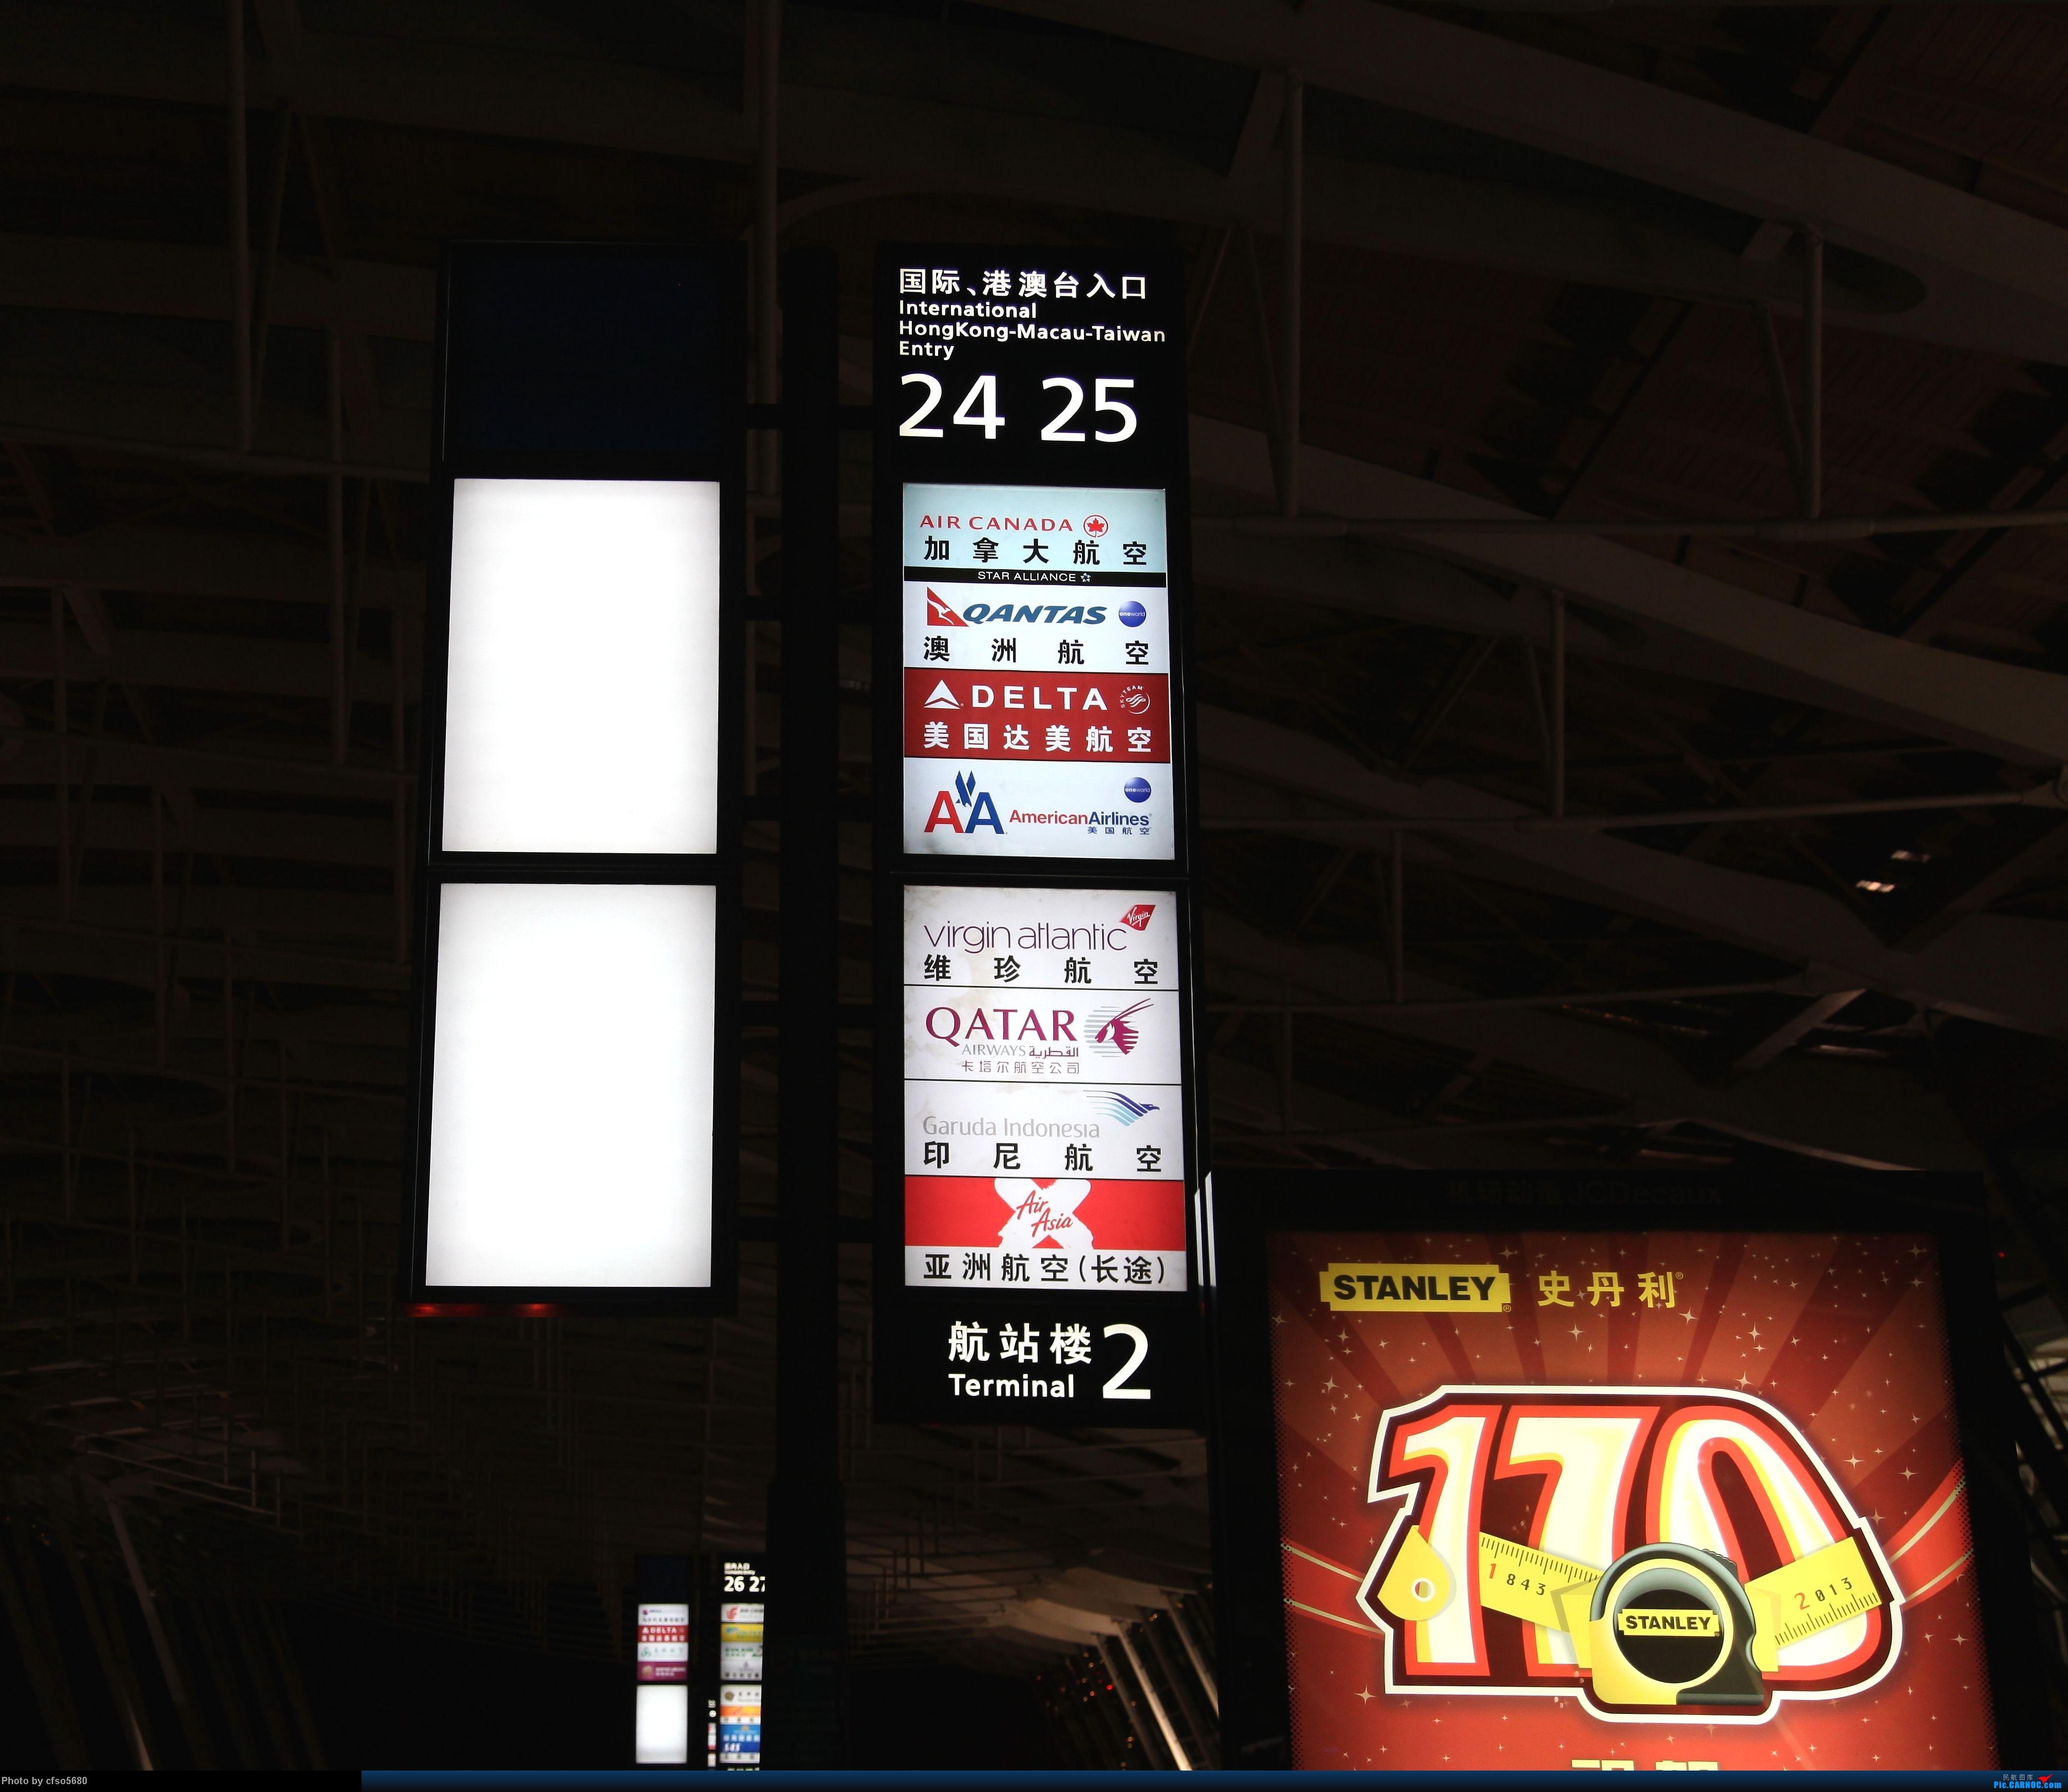 Re:[原创]2013大马拍机之旅,有彩绘、有380,飞机多多,惊喜多多。    中国北京首都机场